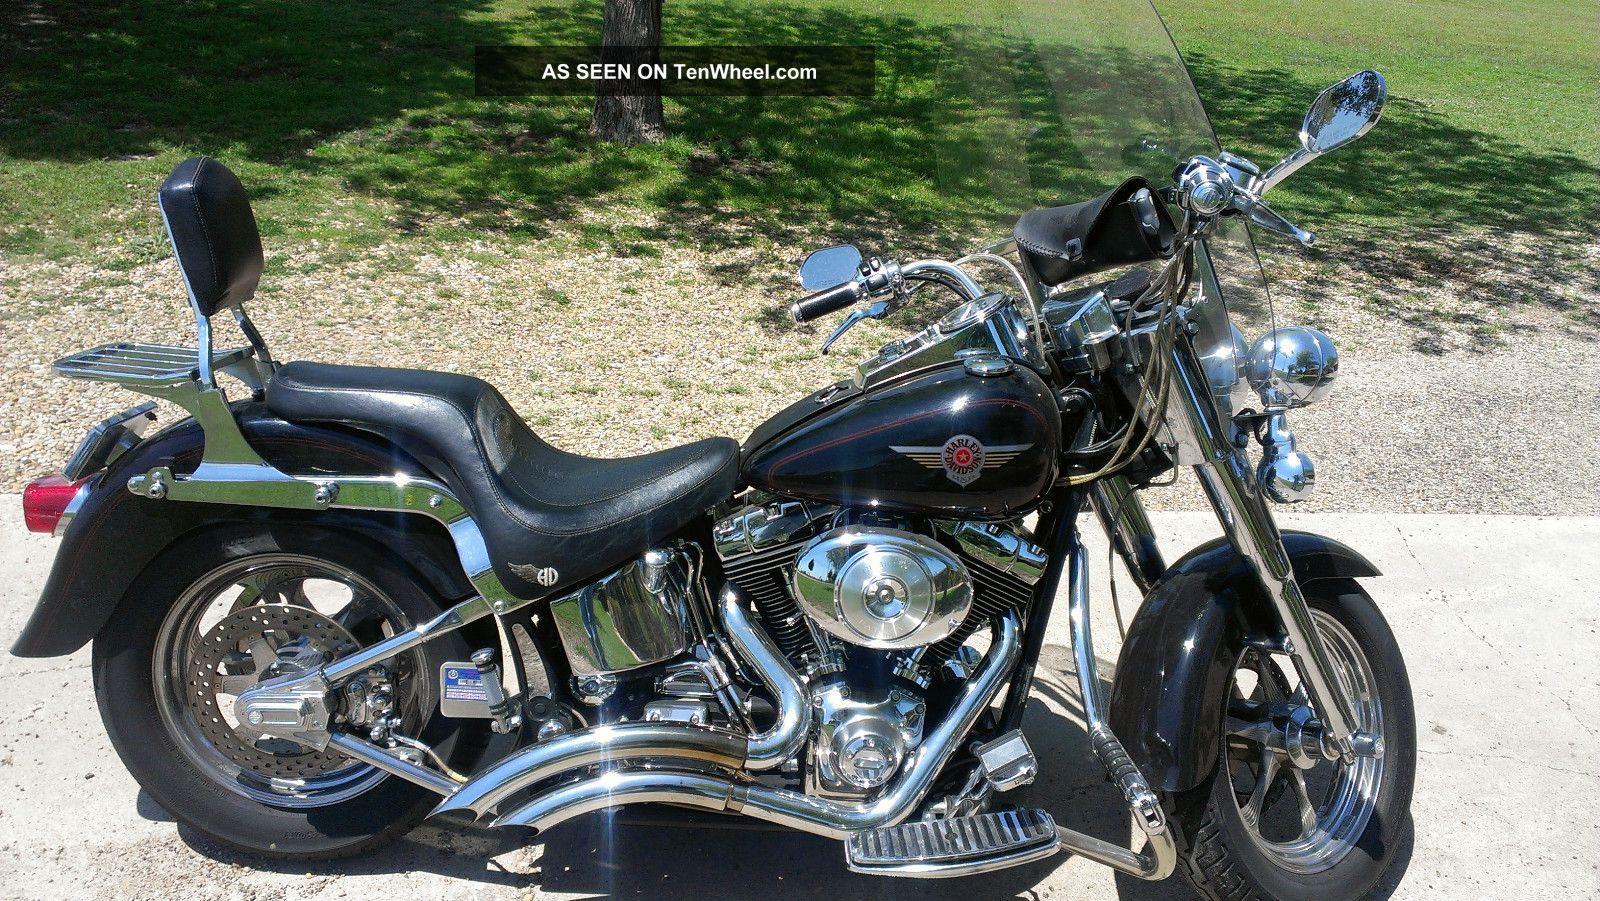 2000 Harley Davidson Fatboy Flstf Softail photo